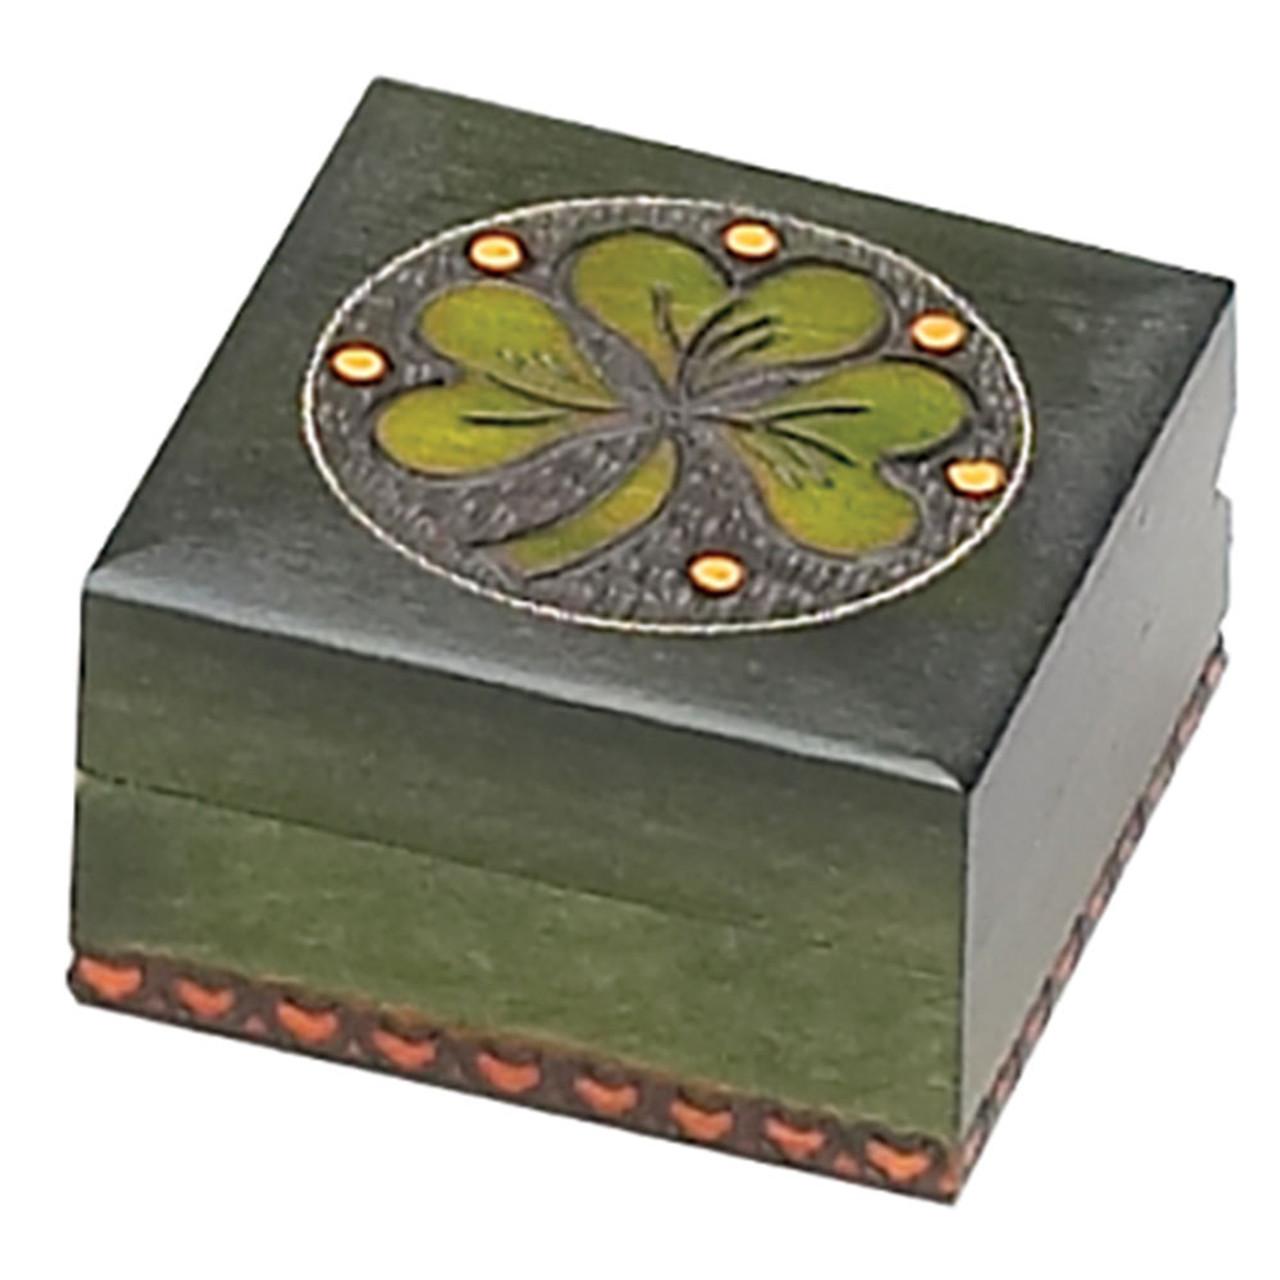 Green Wooden Keepsake Box with Shamrock